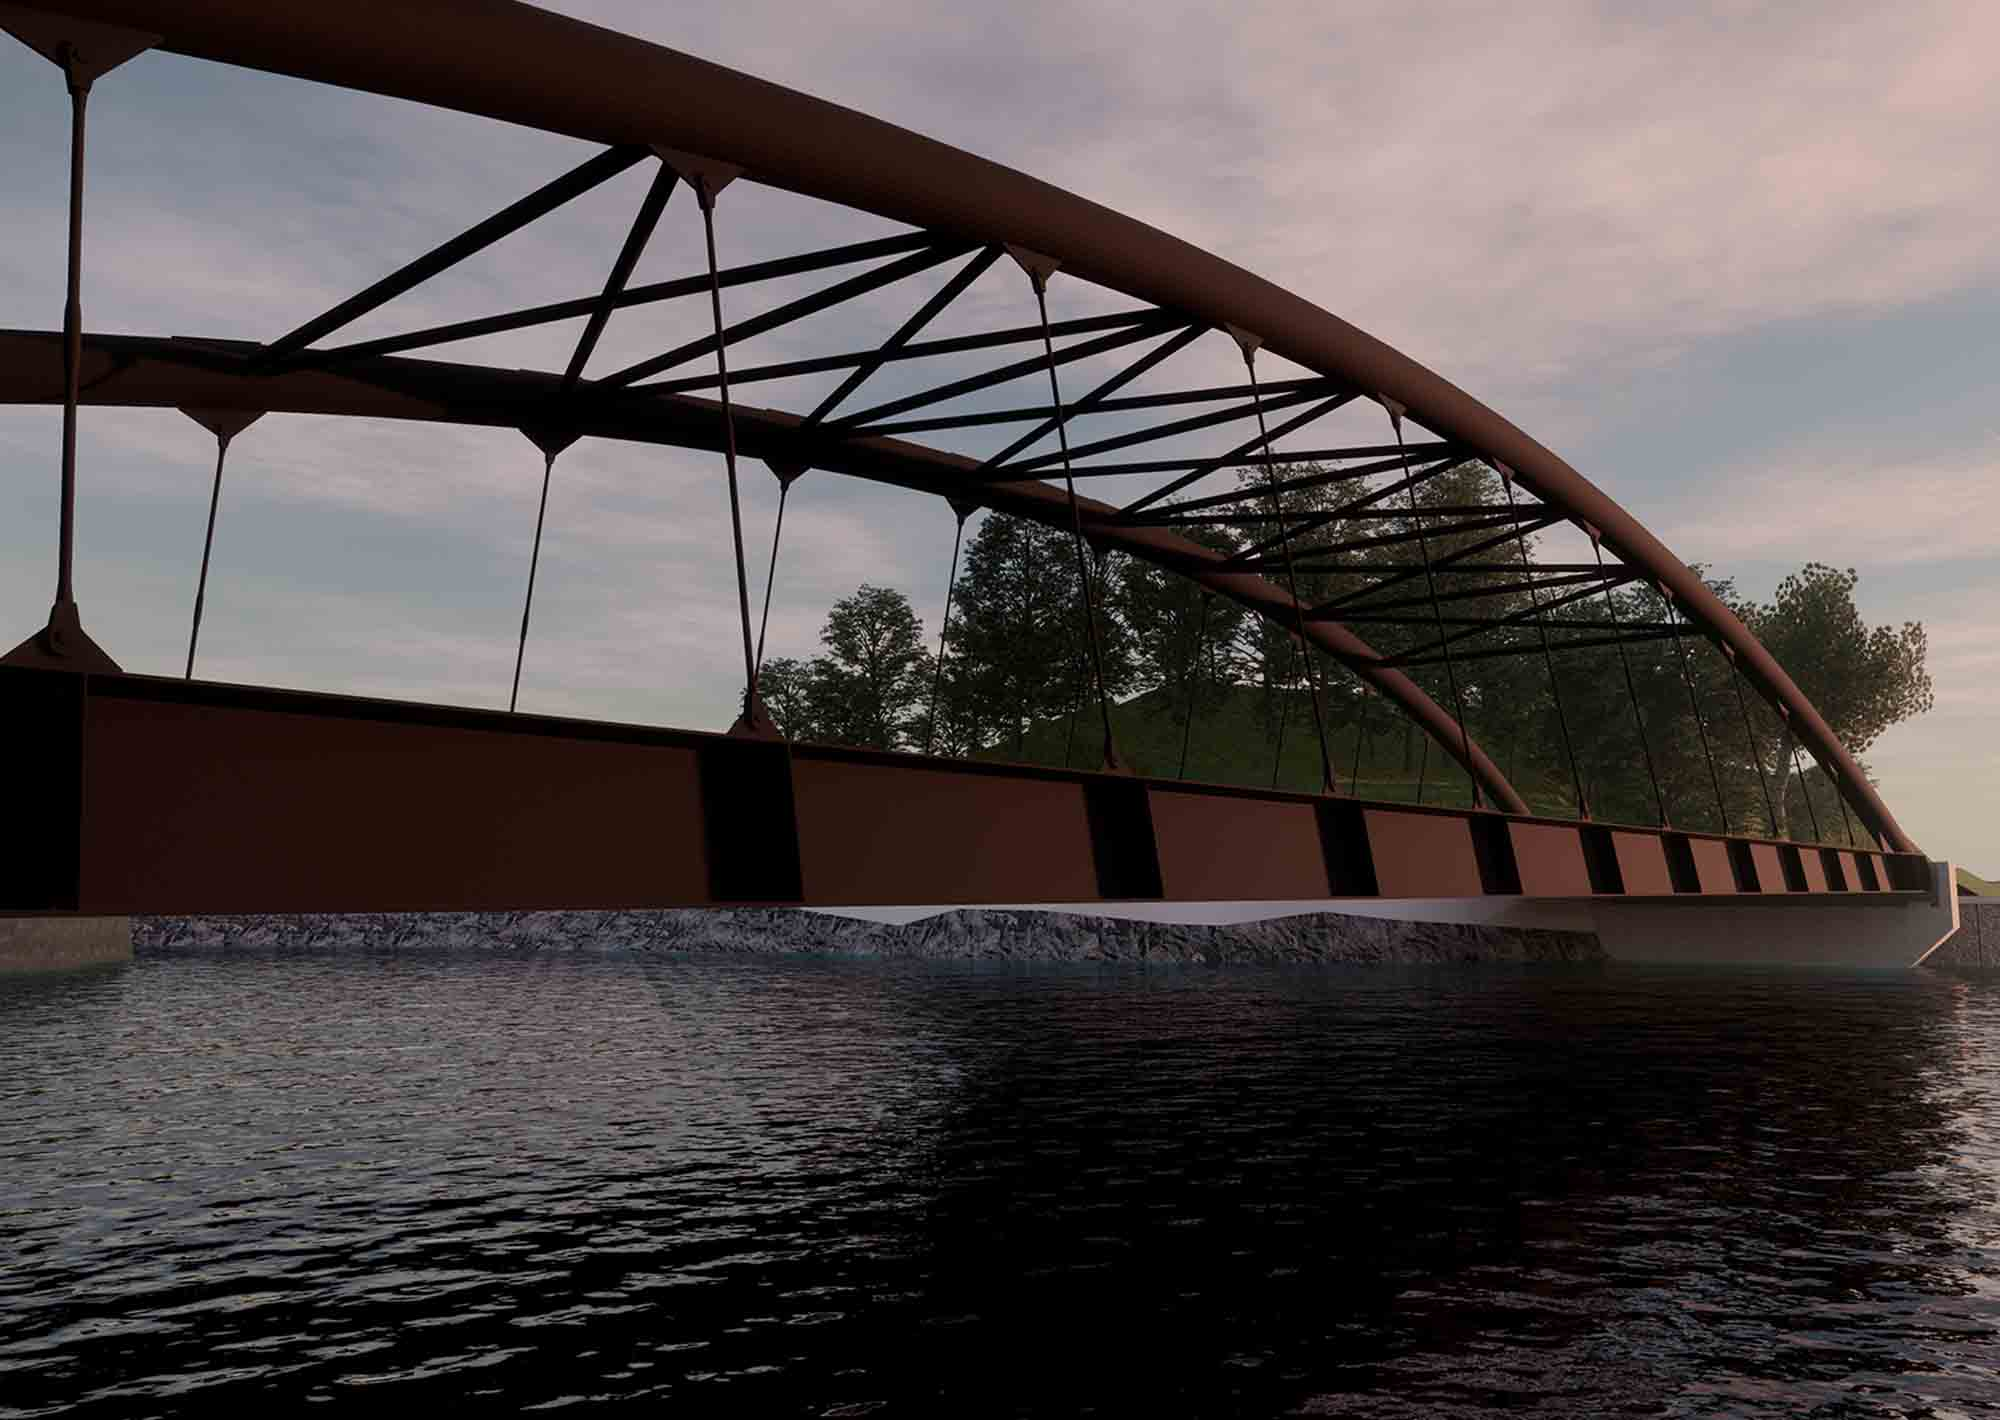 nuovo Ponte di Barcis, rendering 3D